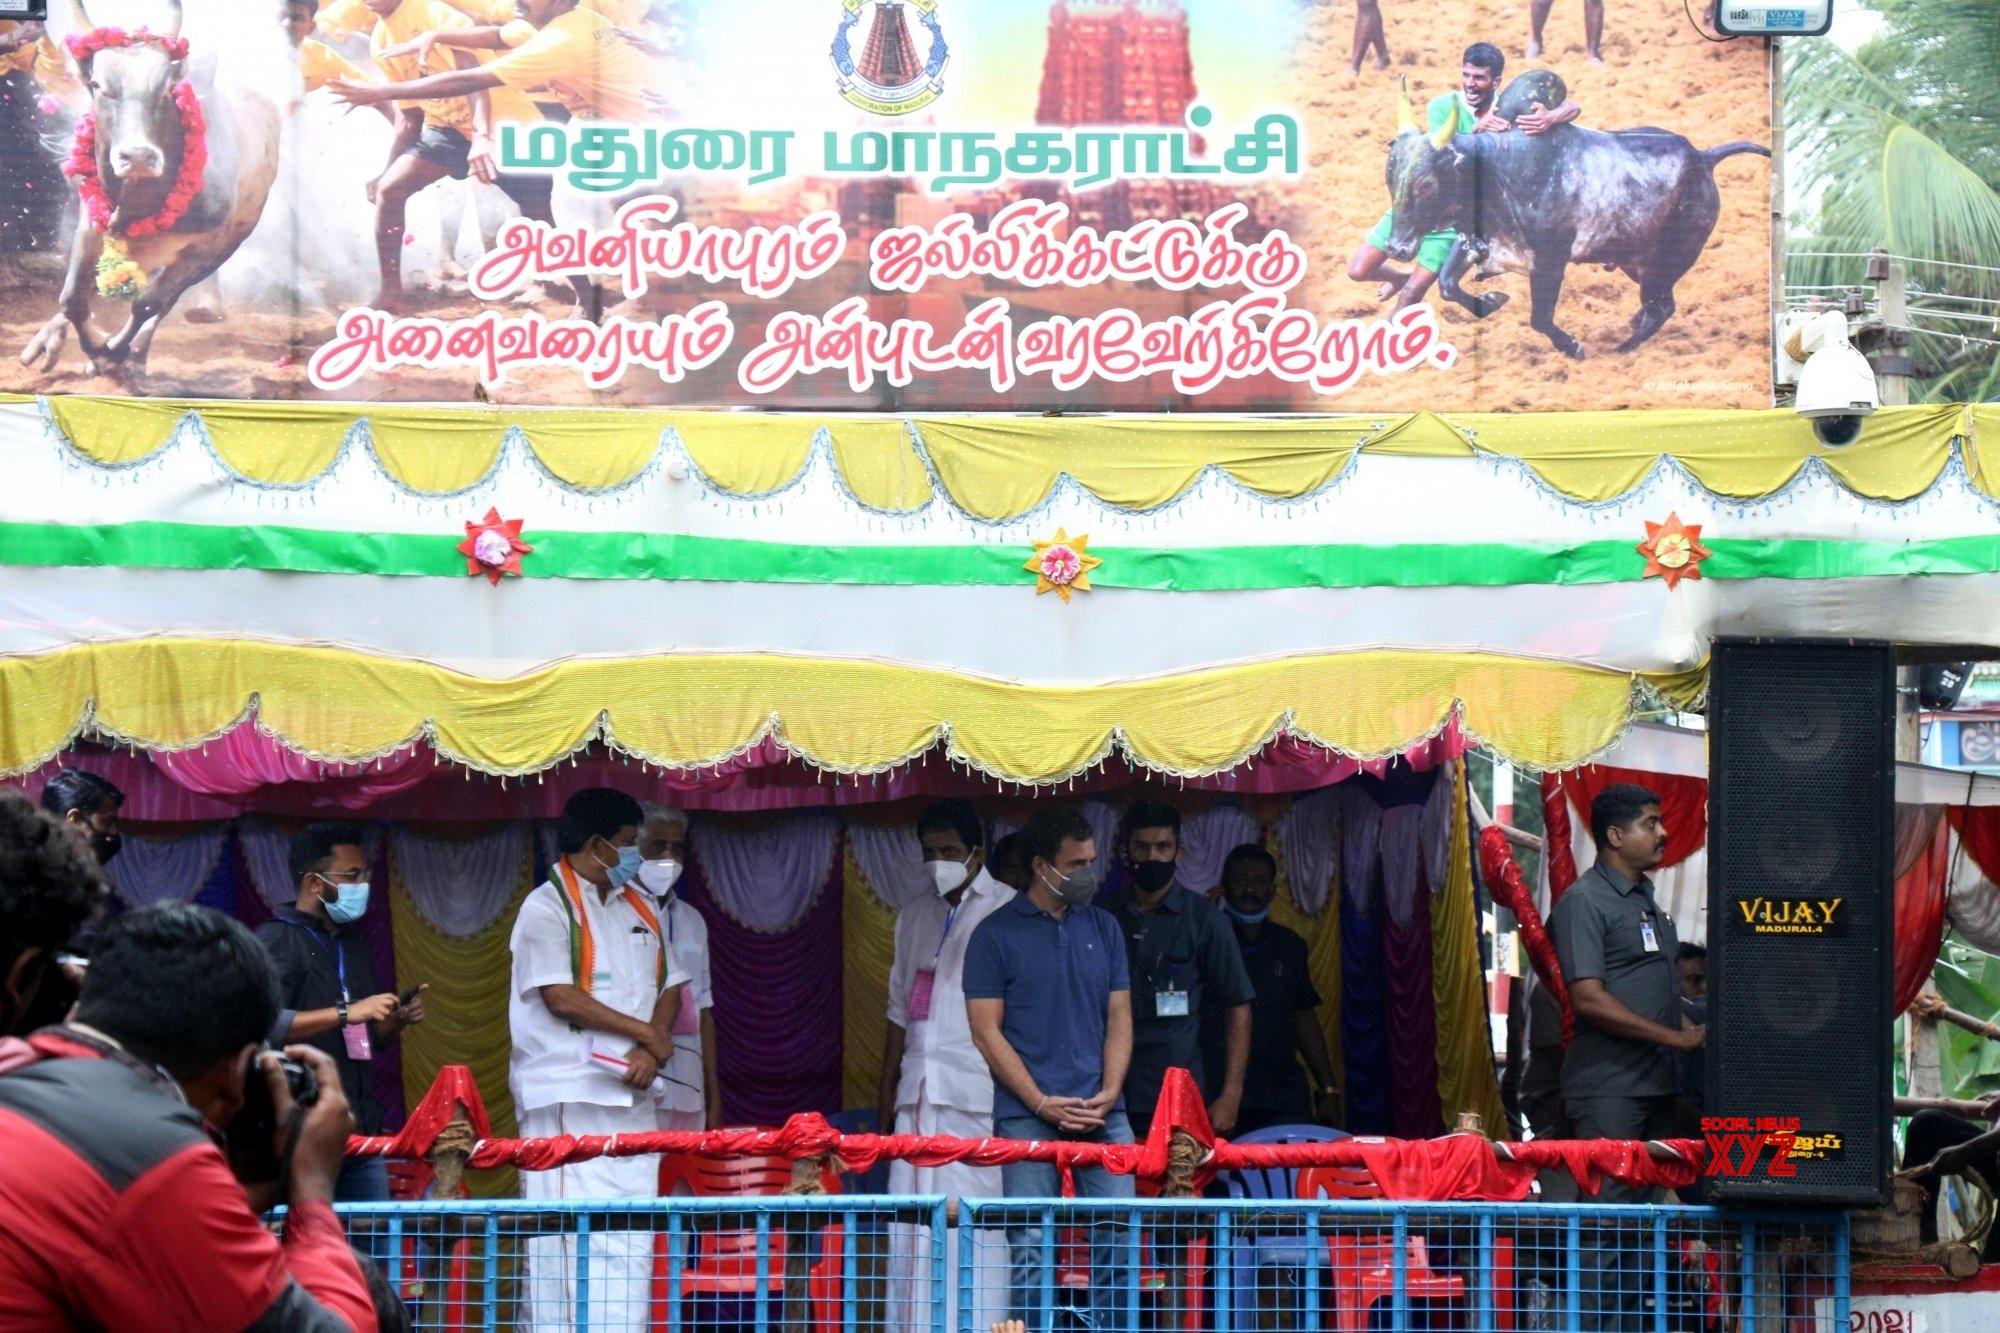 Chennai: - Tamil Nadu's traditional bull taming festival, Jallikattu in AvaniyaPuram #Gallery